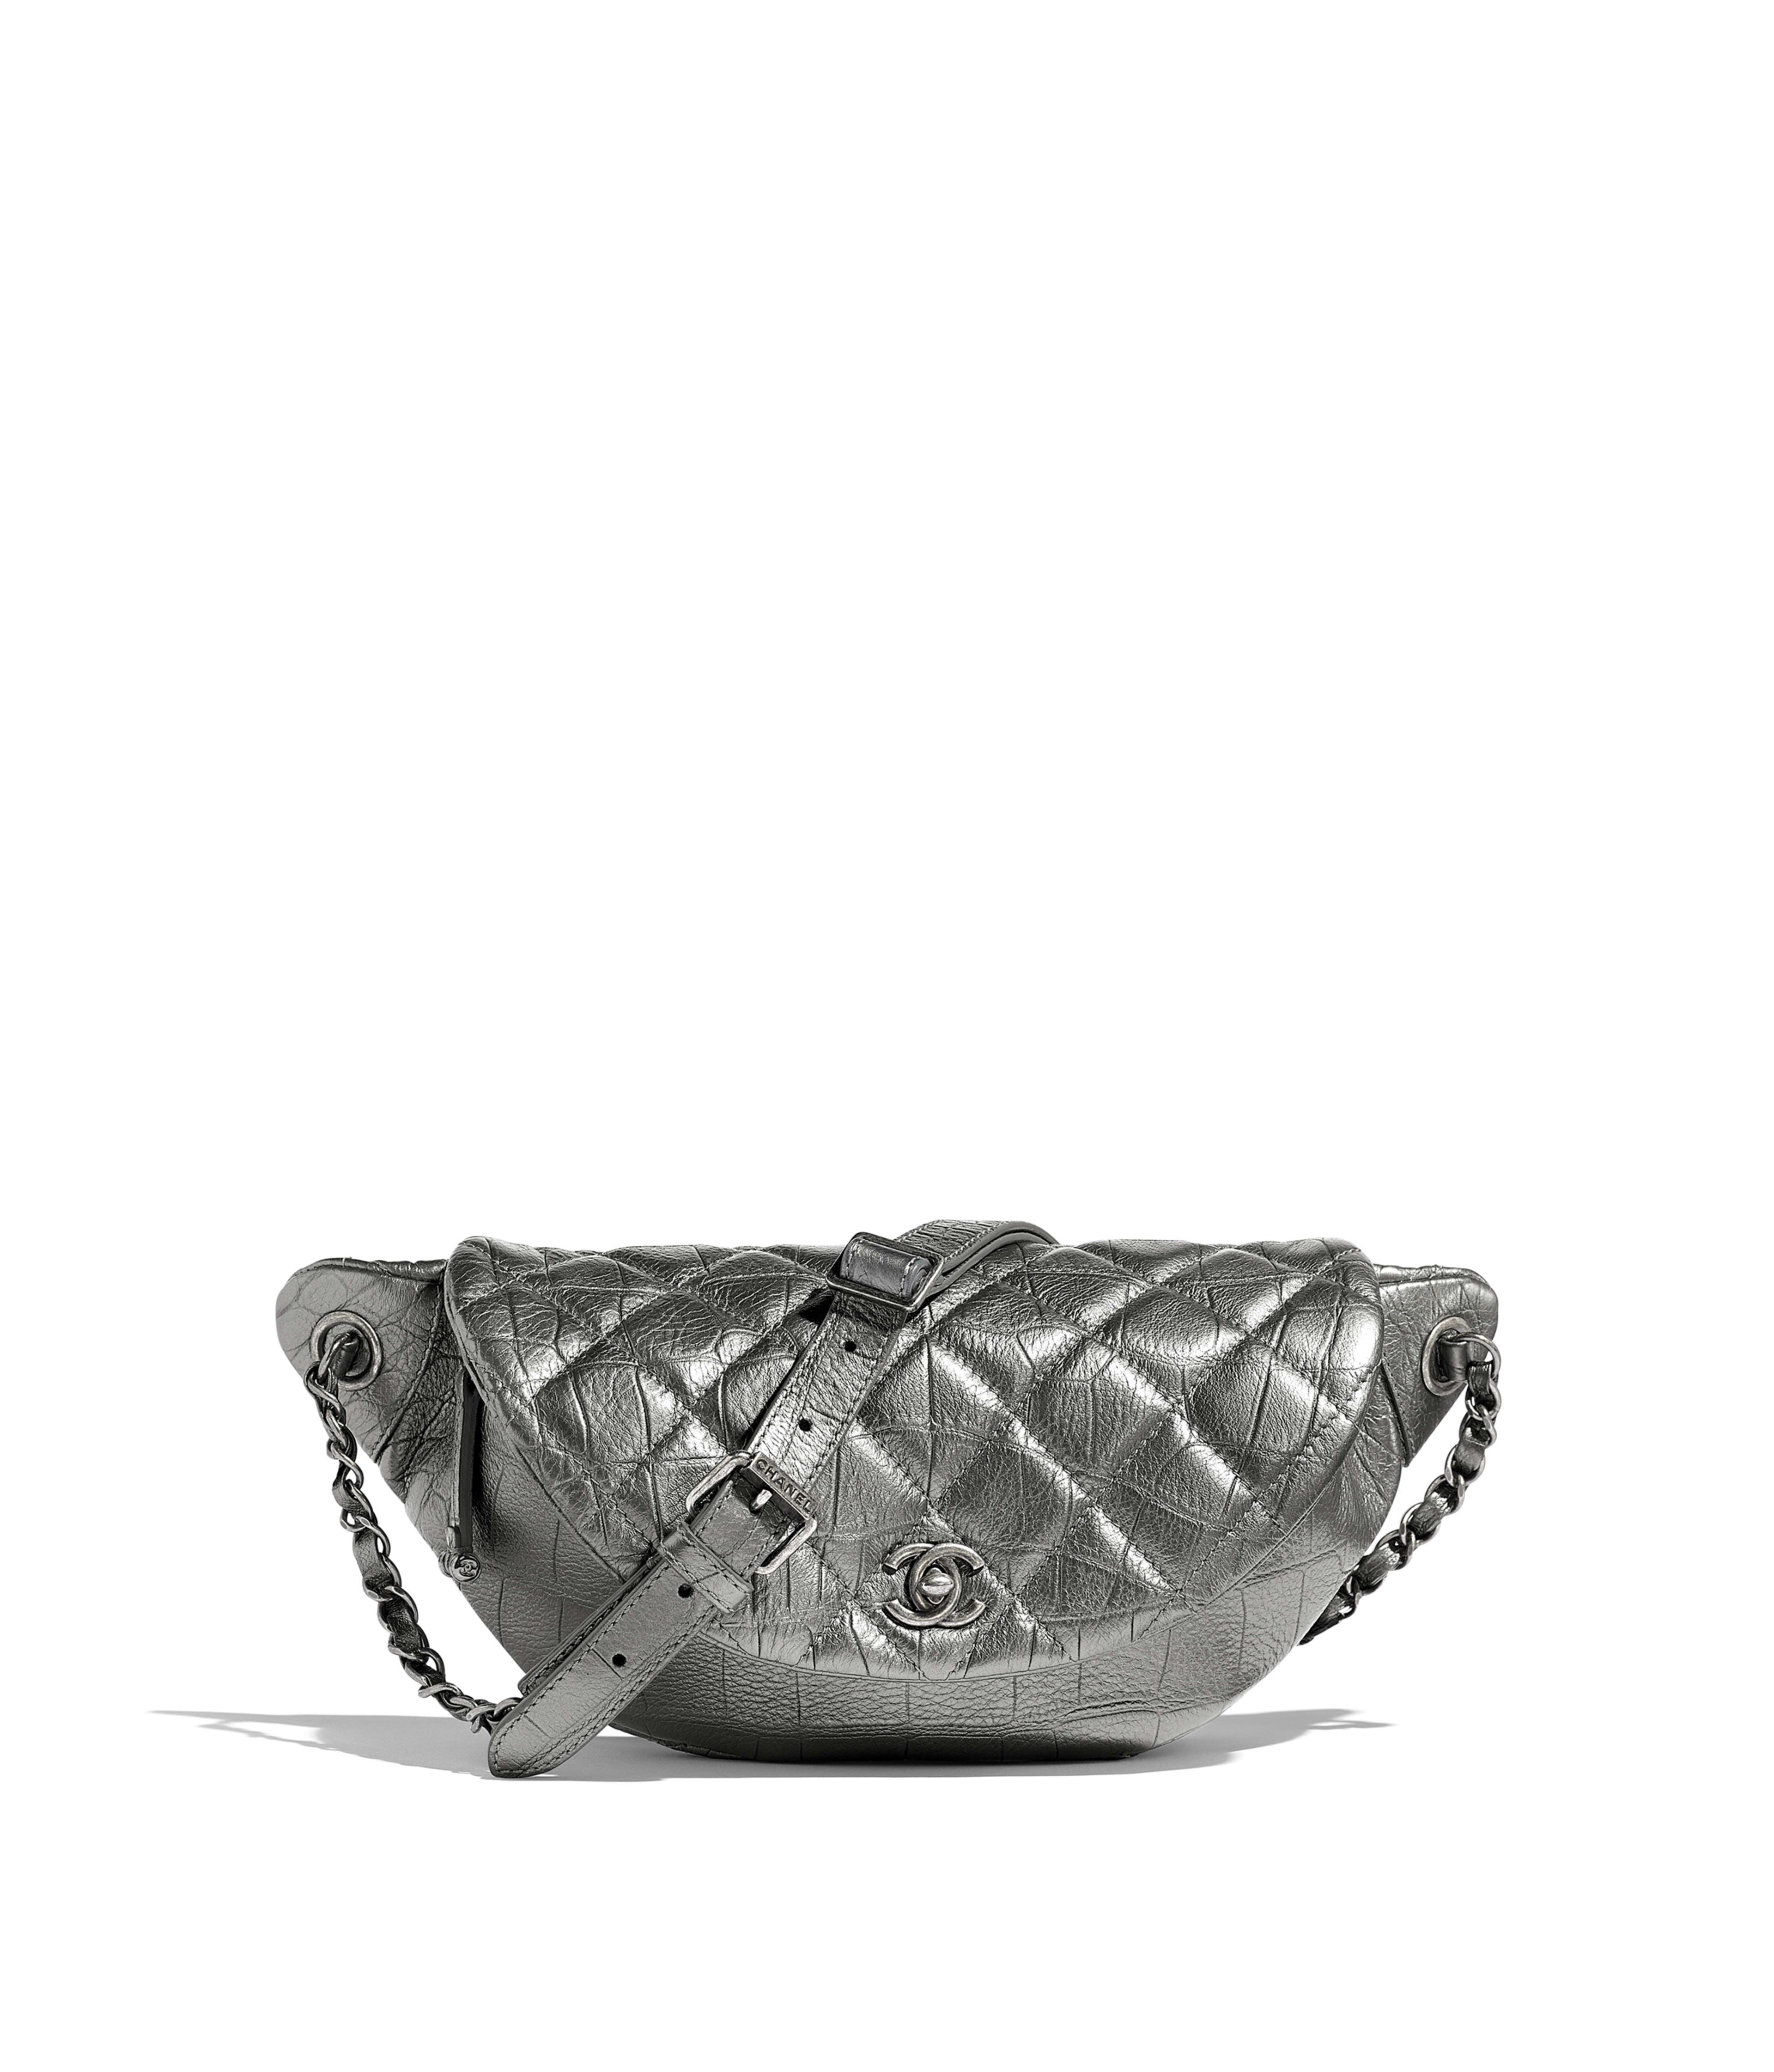 cebedcccdb Waist Bags - Handbags | CHANEL